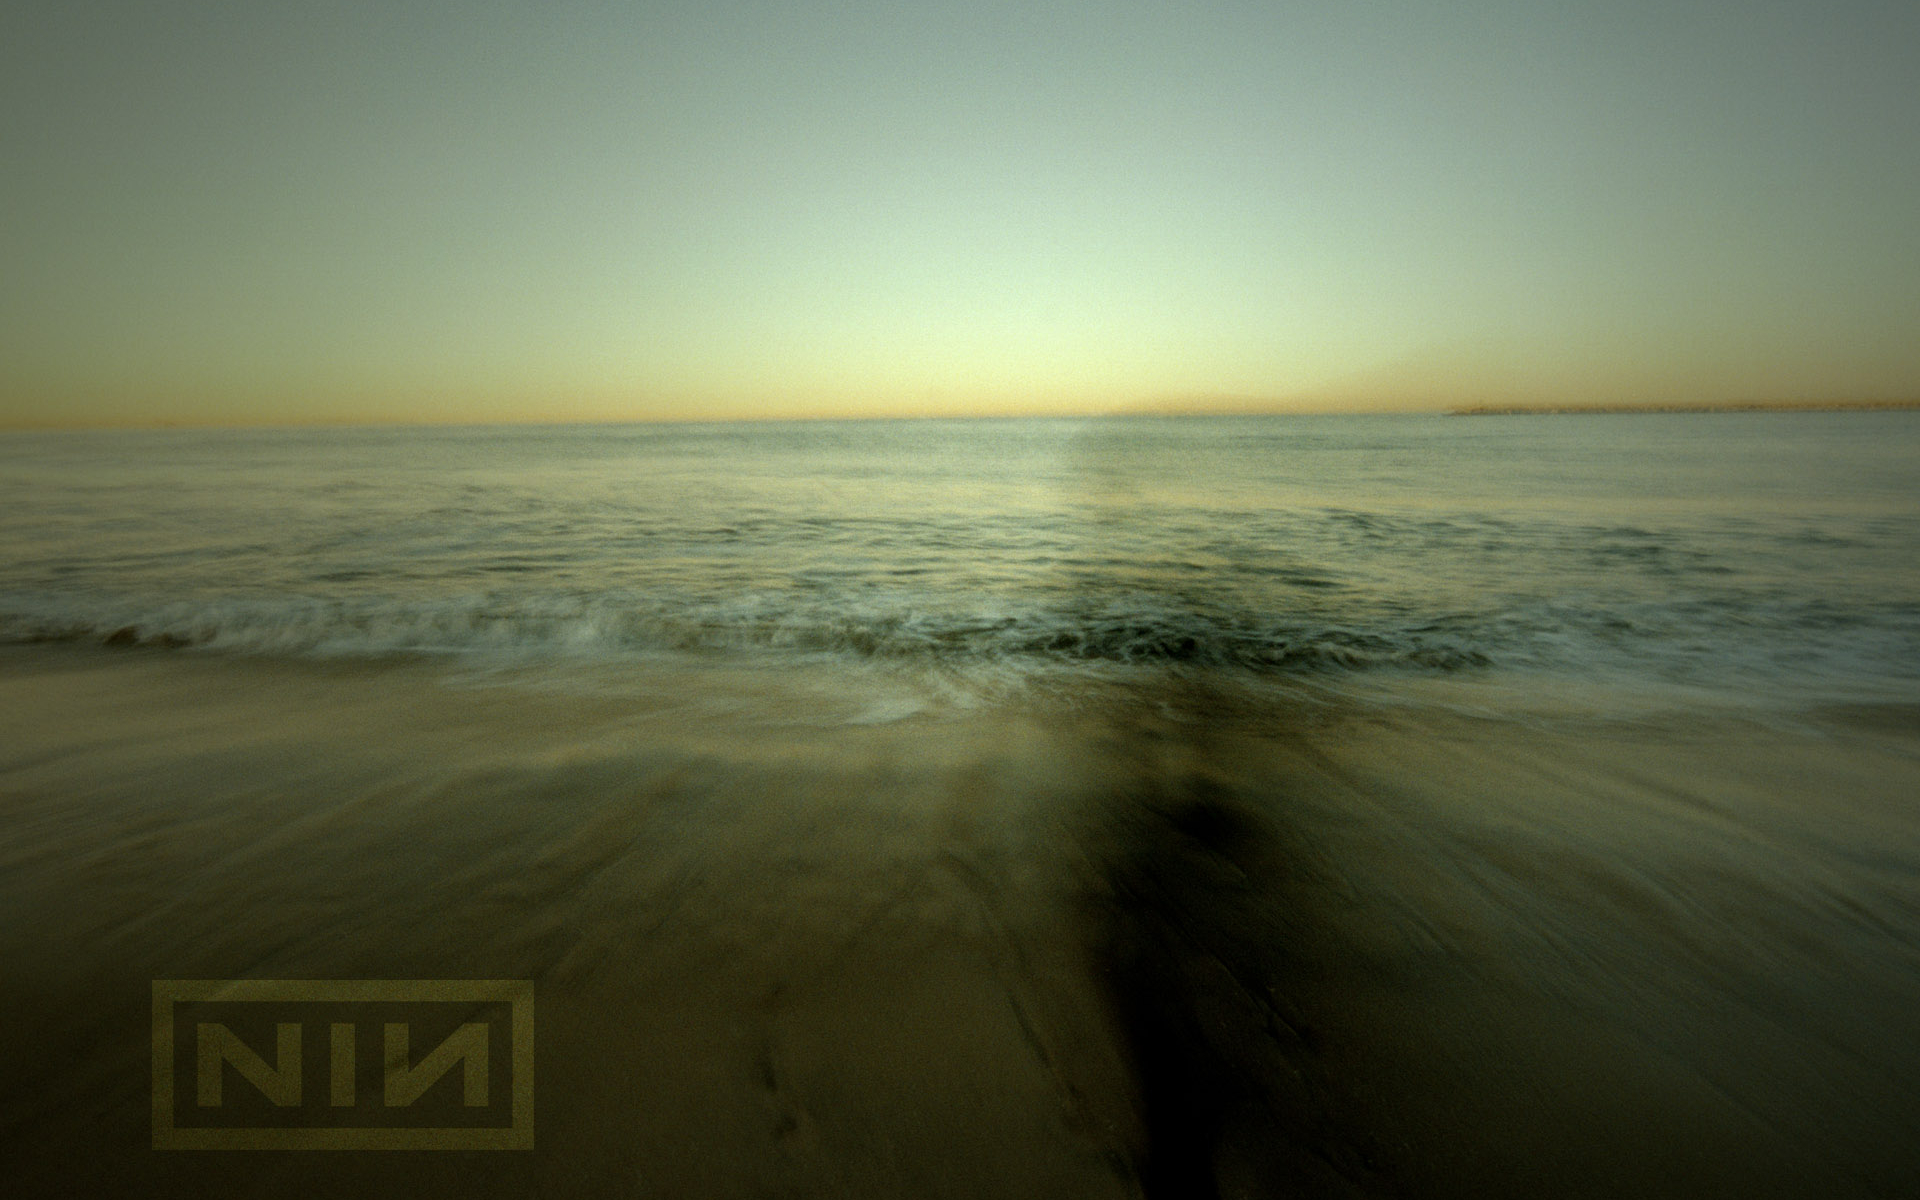 Nine Inch Nails Art - ID: 79656 - Art Abyss